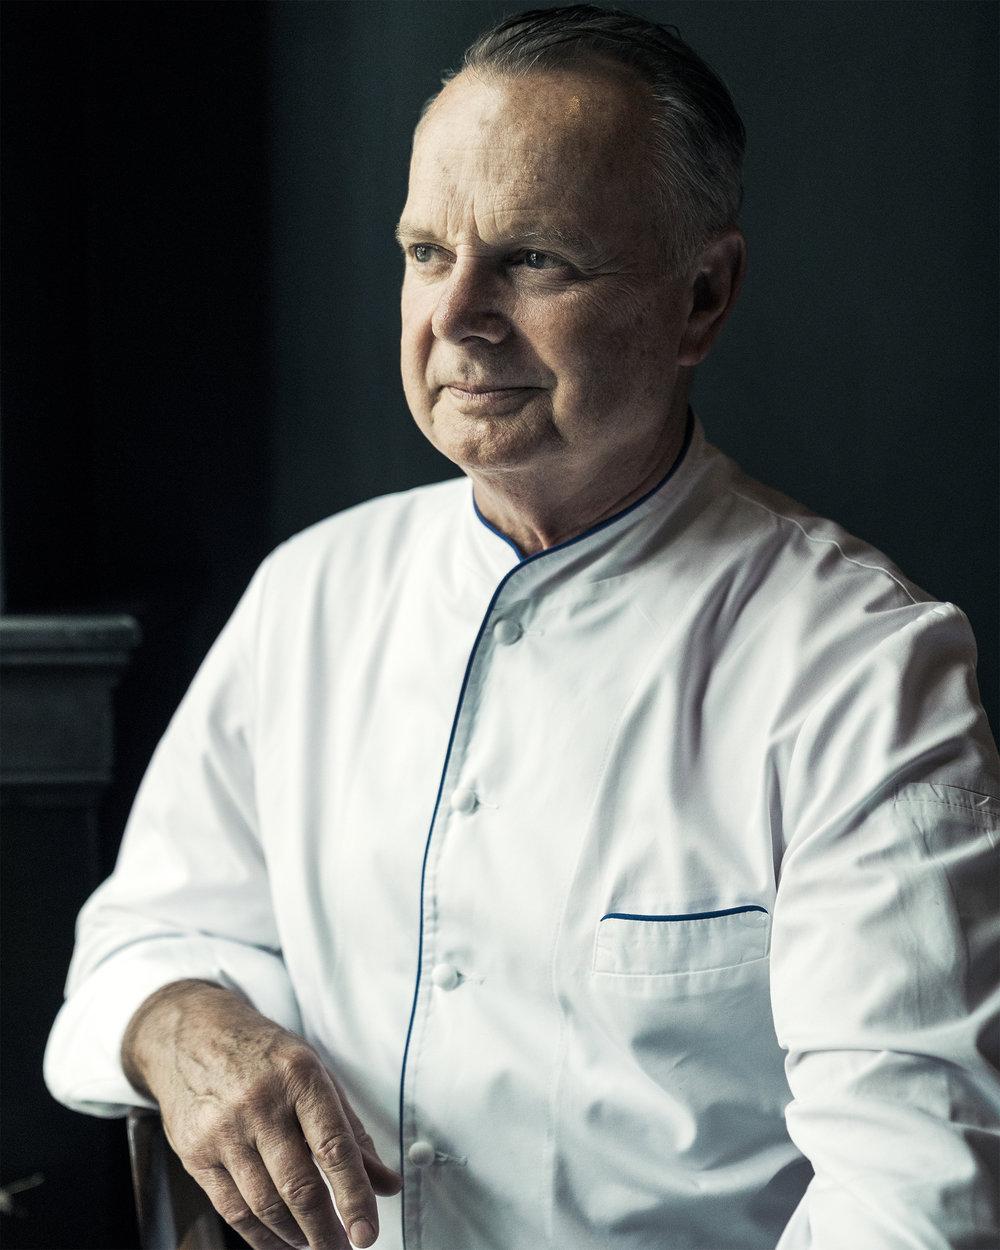 Chef Frank Stitt